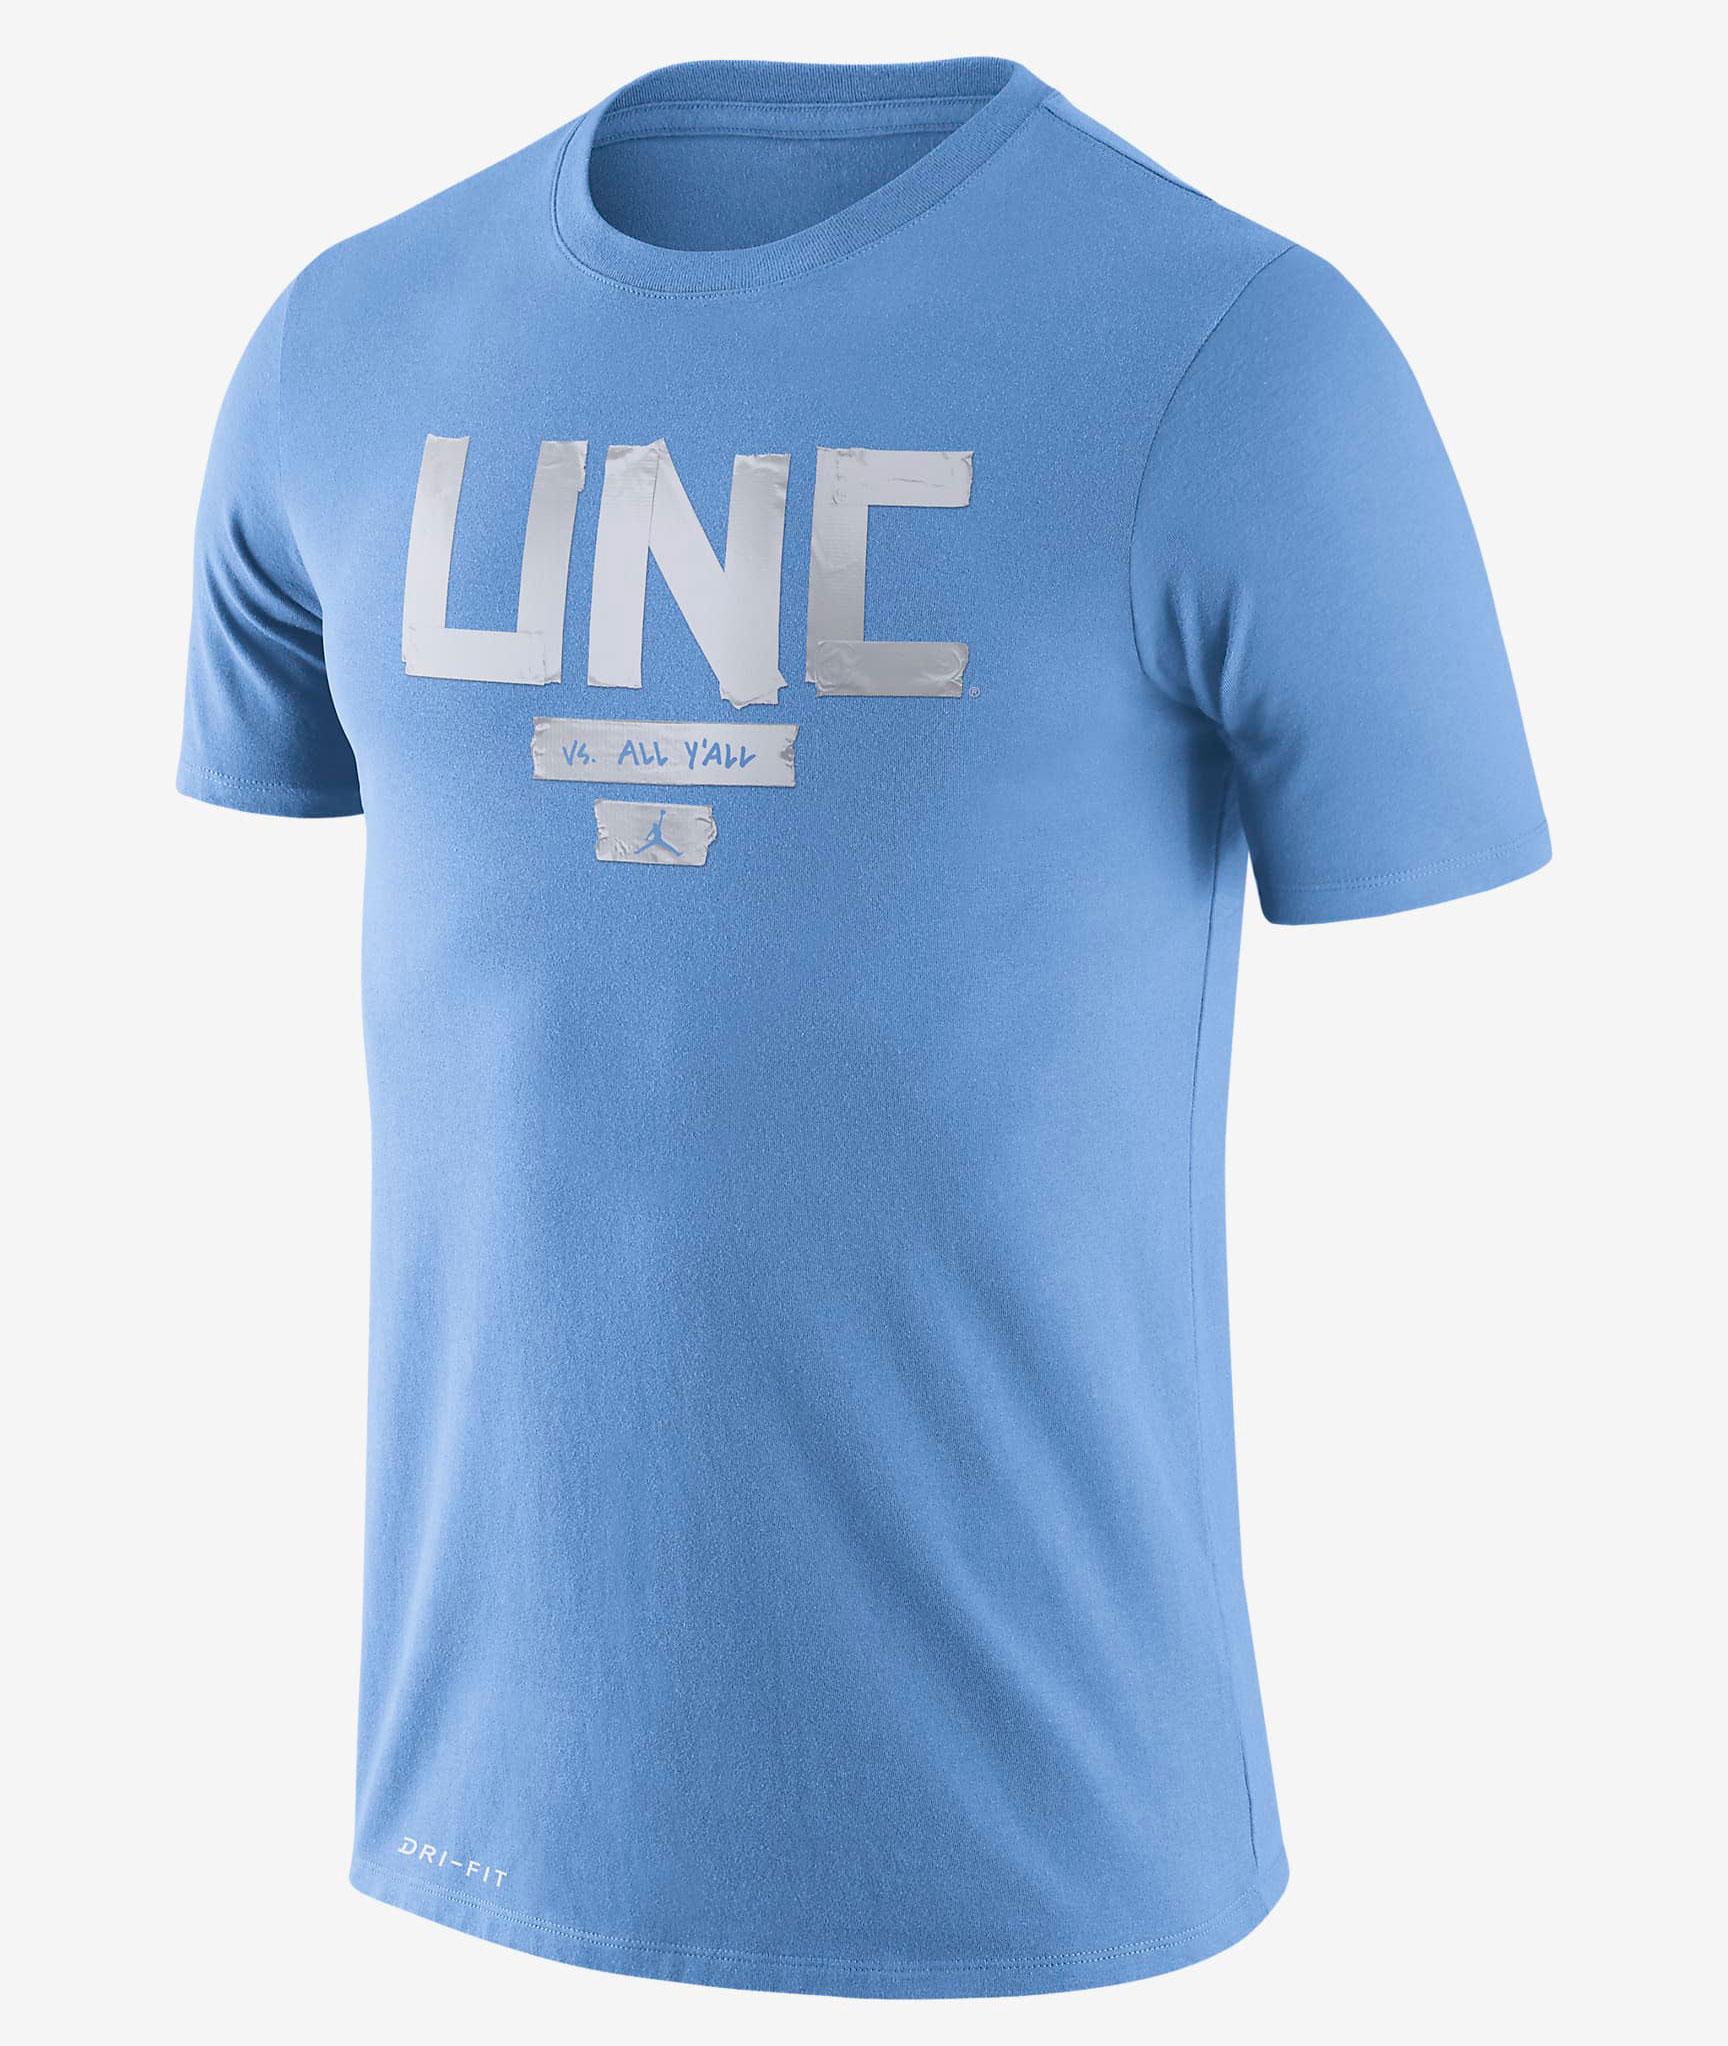 jordan-university-blue-unc-vs-all-yall-shirt-